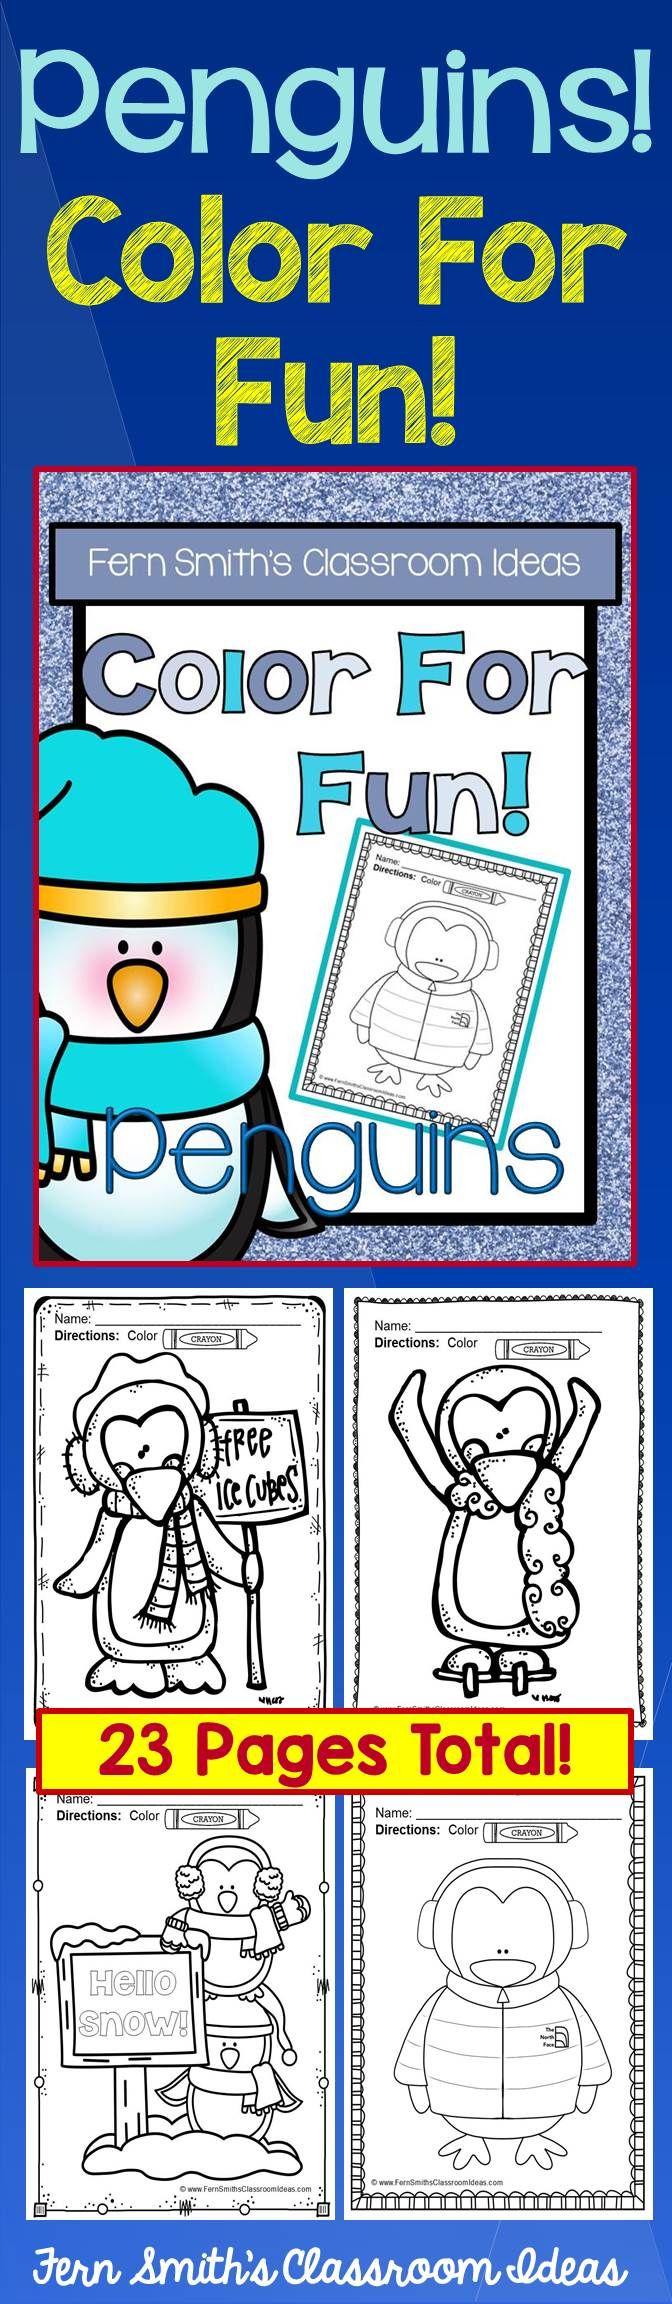 29 best pinguïns images on Pinterest | Penguin coloring pages ...